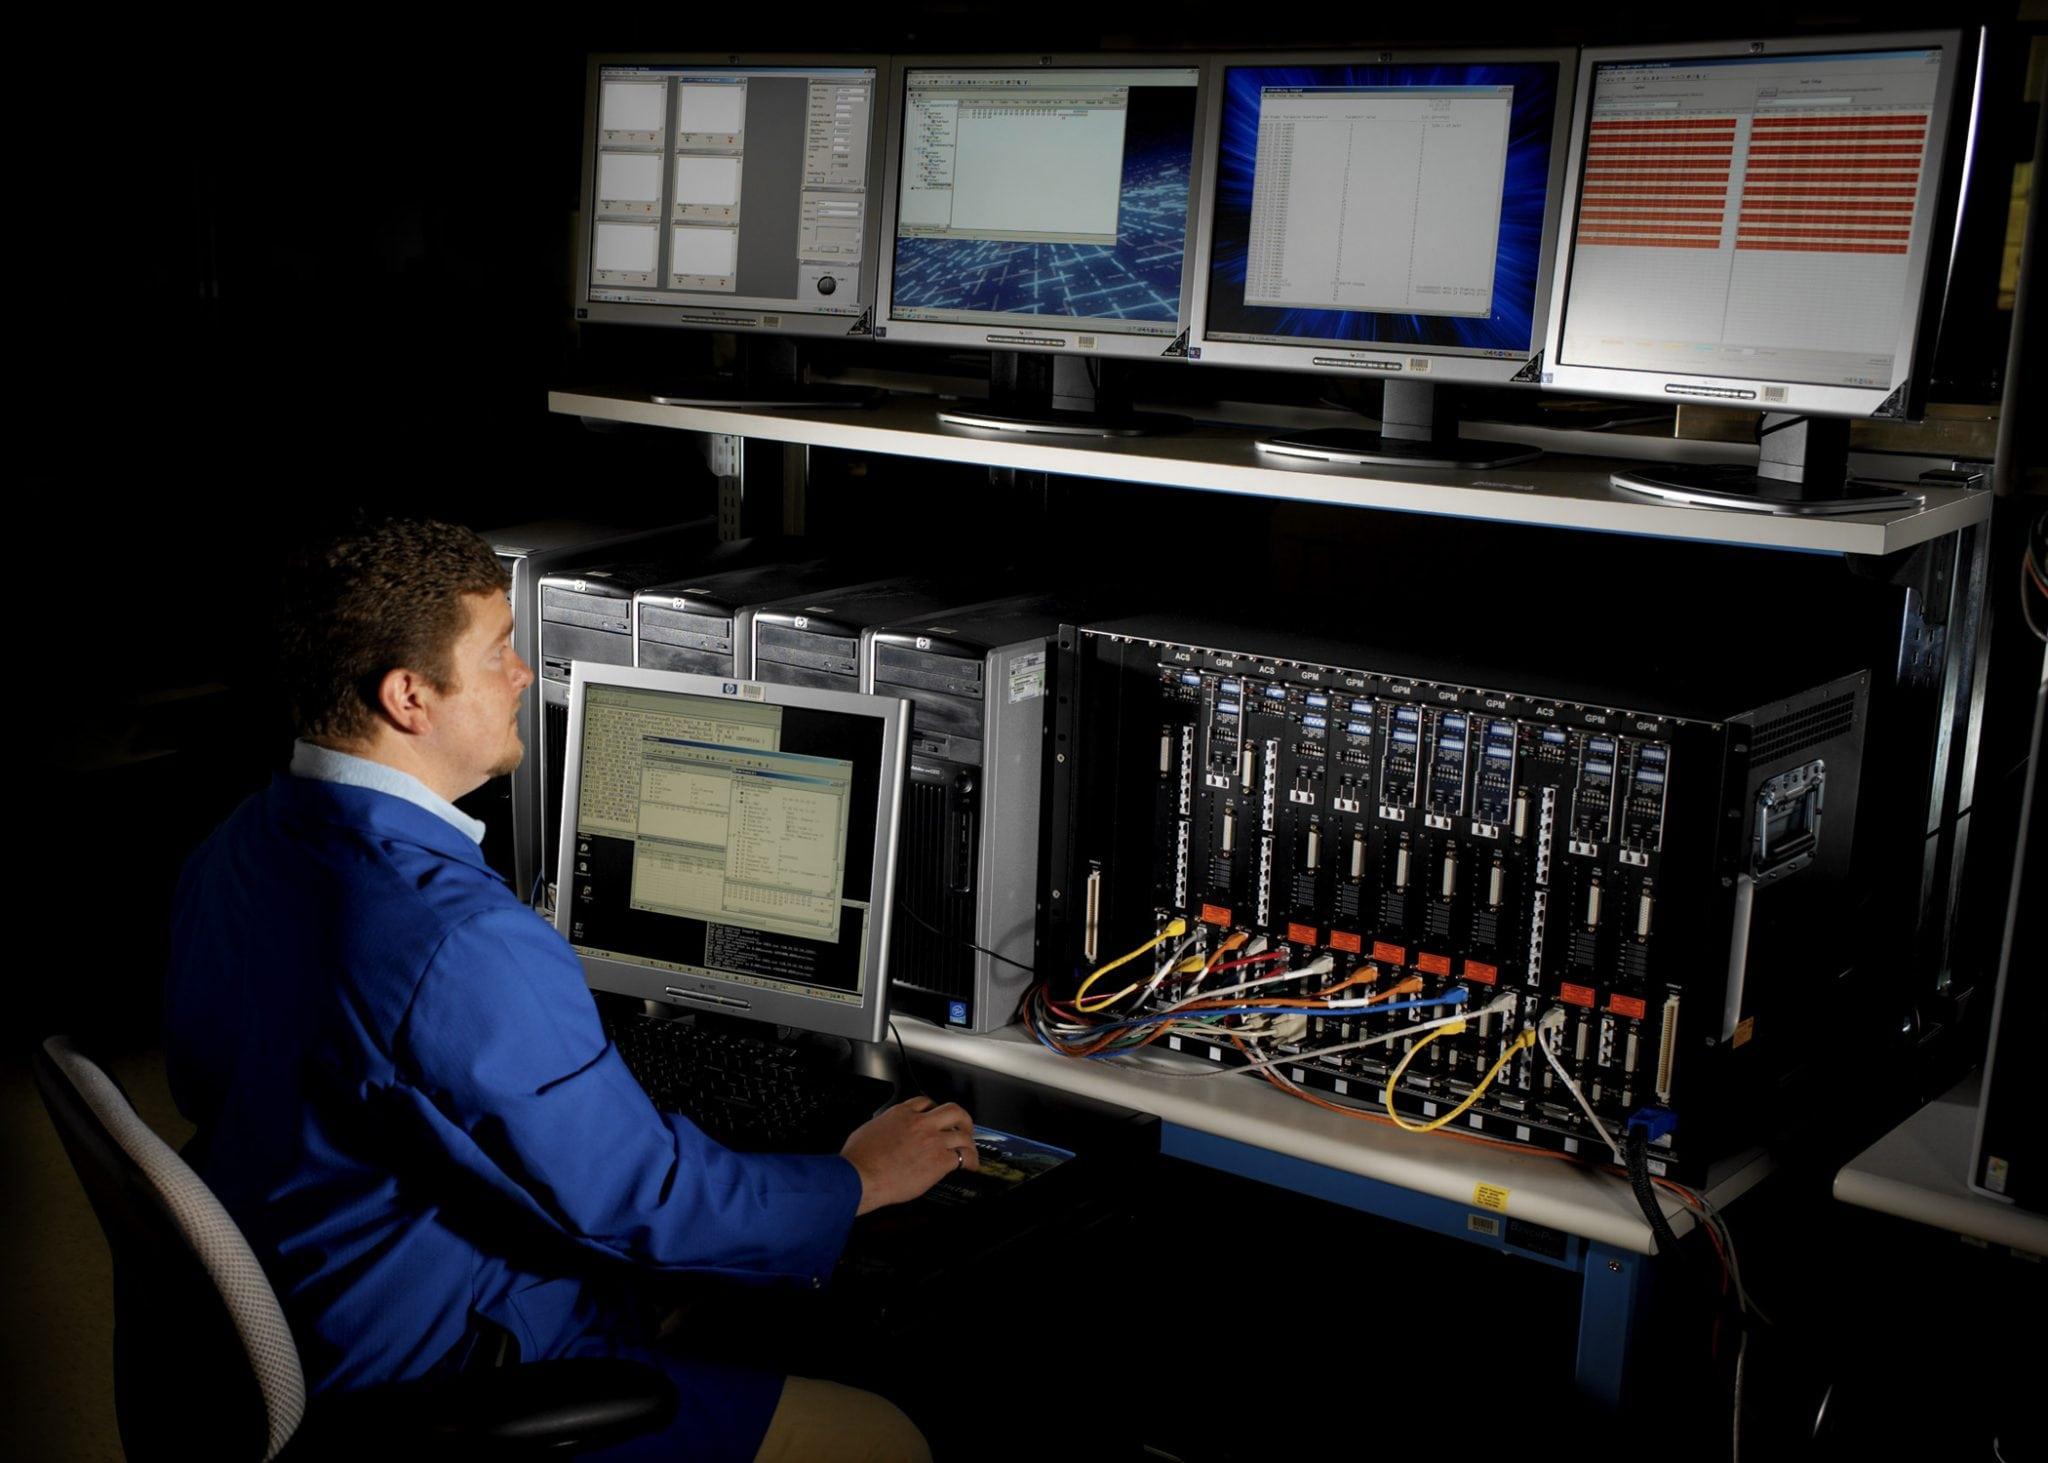 The GE common core avionics system